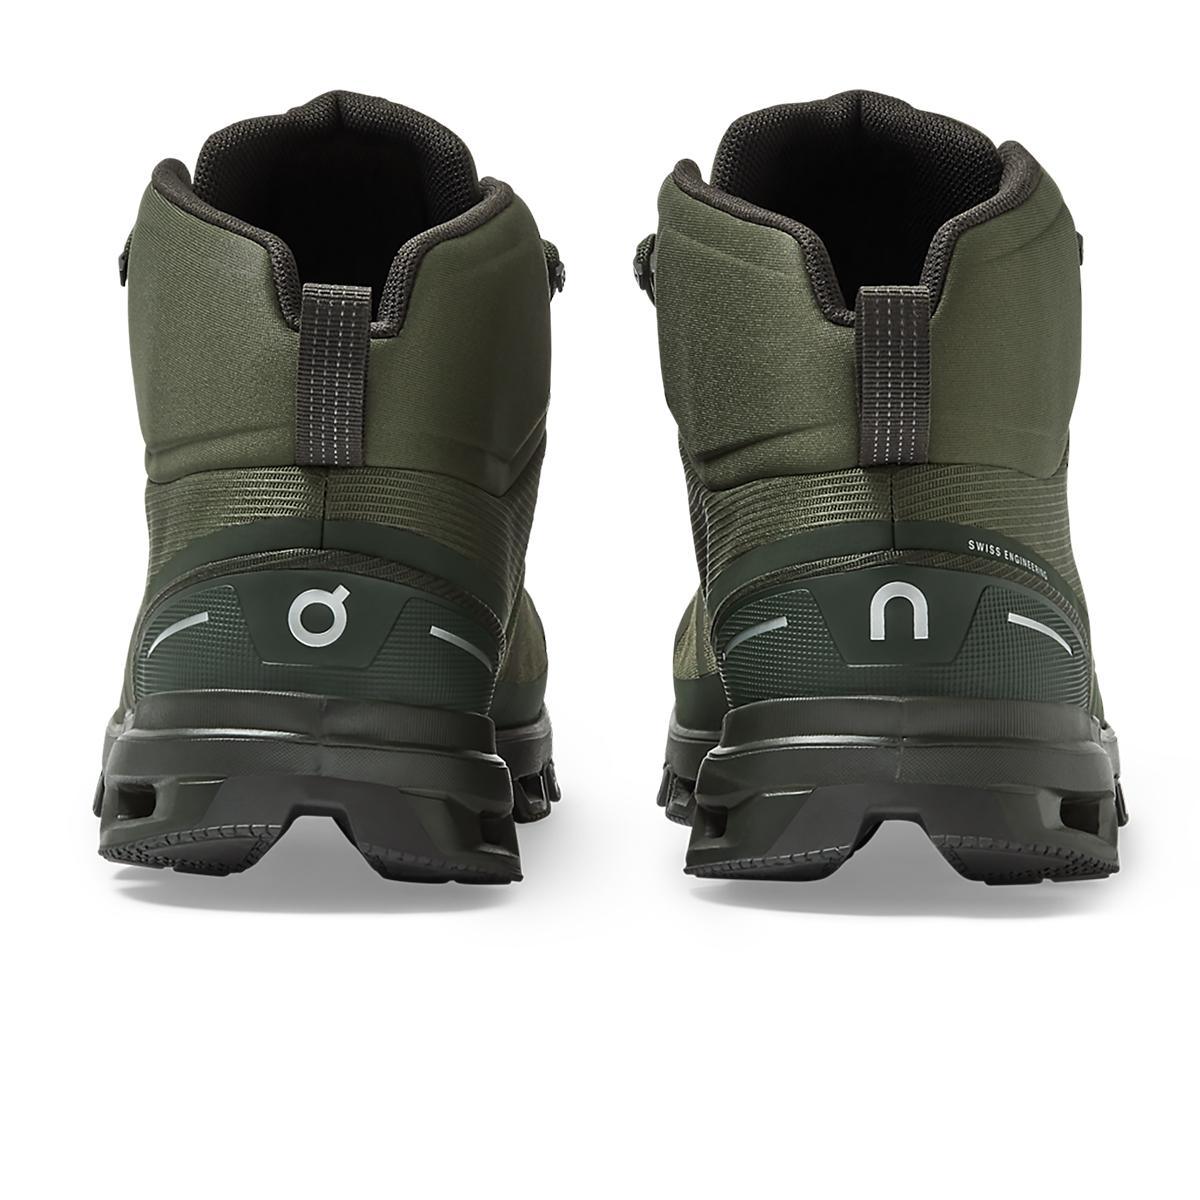 Men's On Cloudrock Waterproof Trail Running Shoe - Color: Jungle/Fir - Size: 7 - Width: Regular, Jungle/Fir, large, image 3